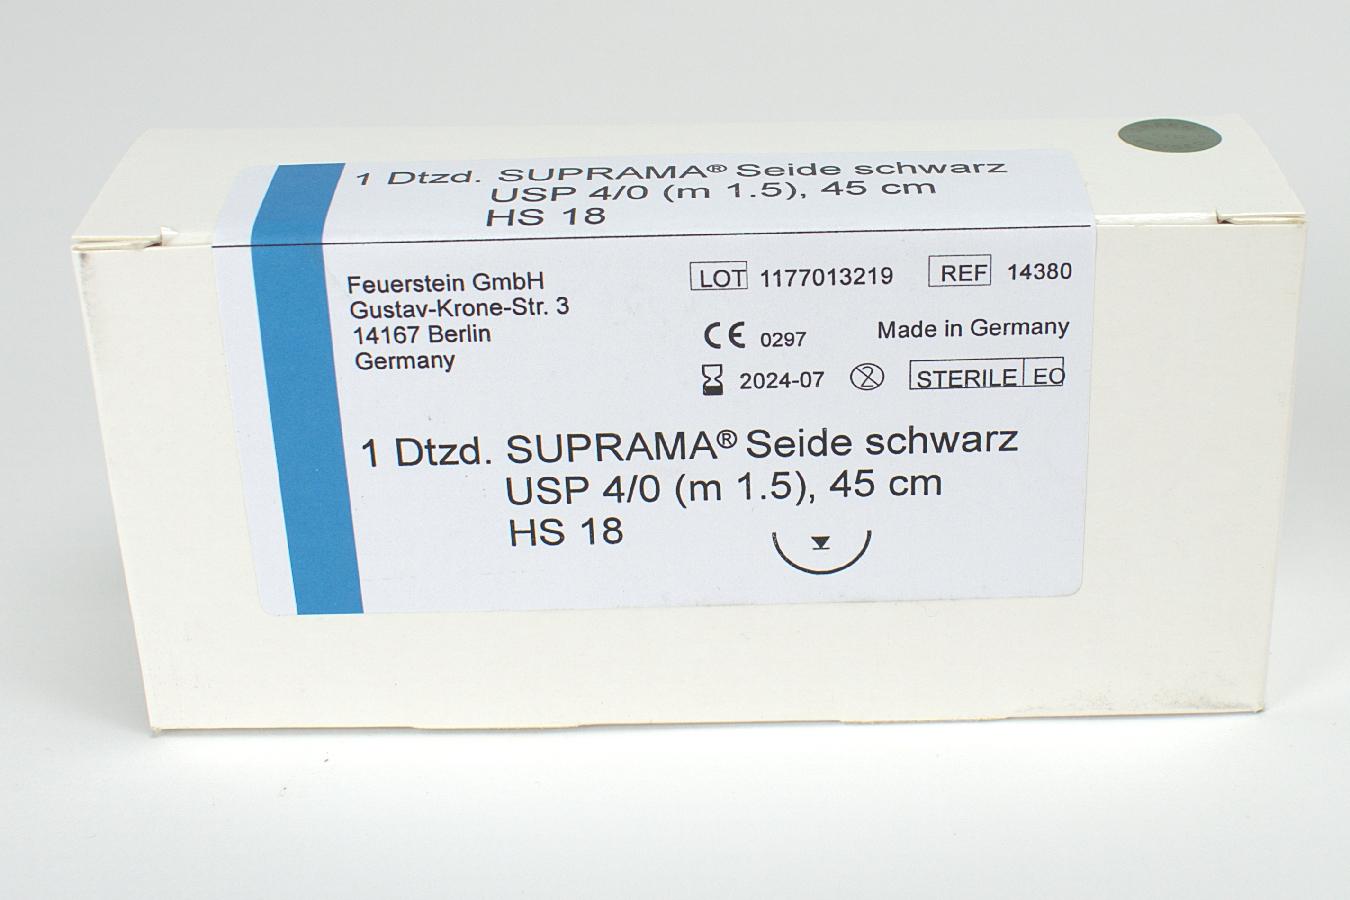 Suprama Seide schwarz HS18 4/0 Dtz